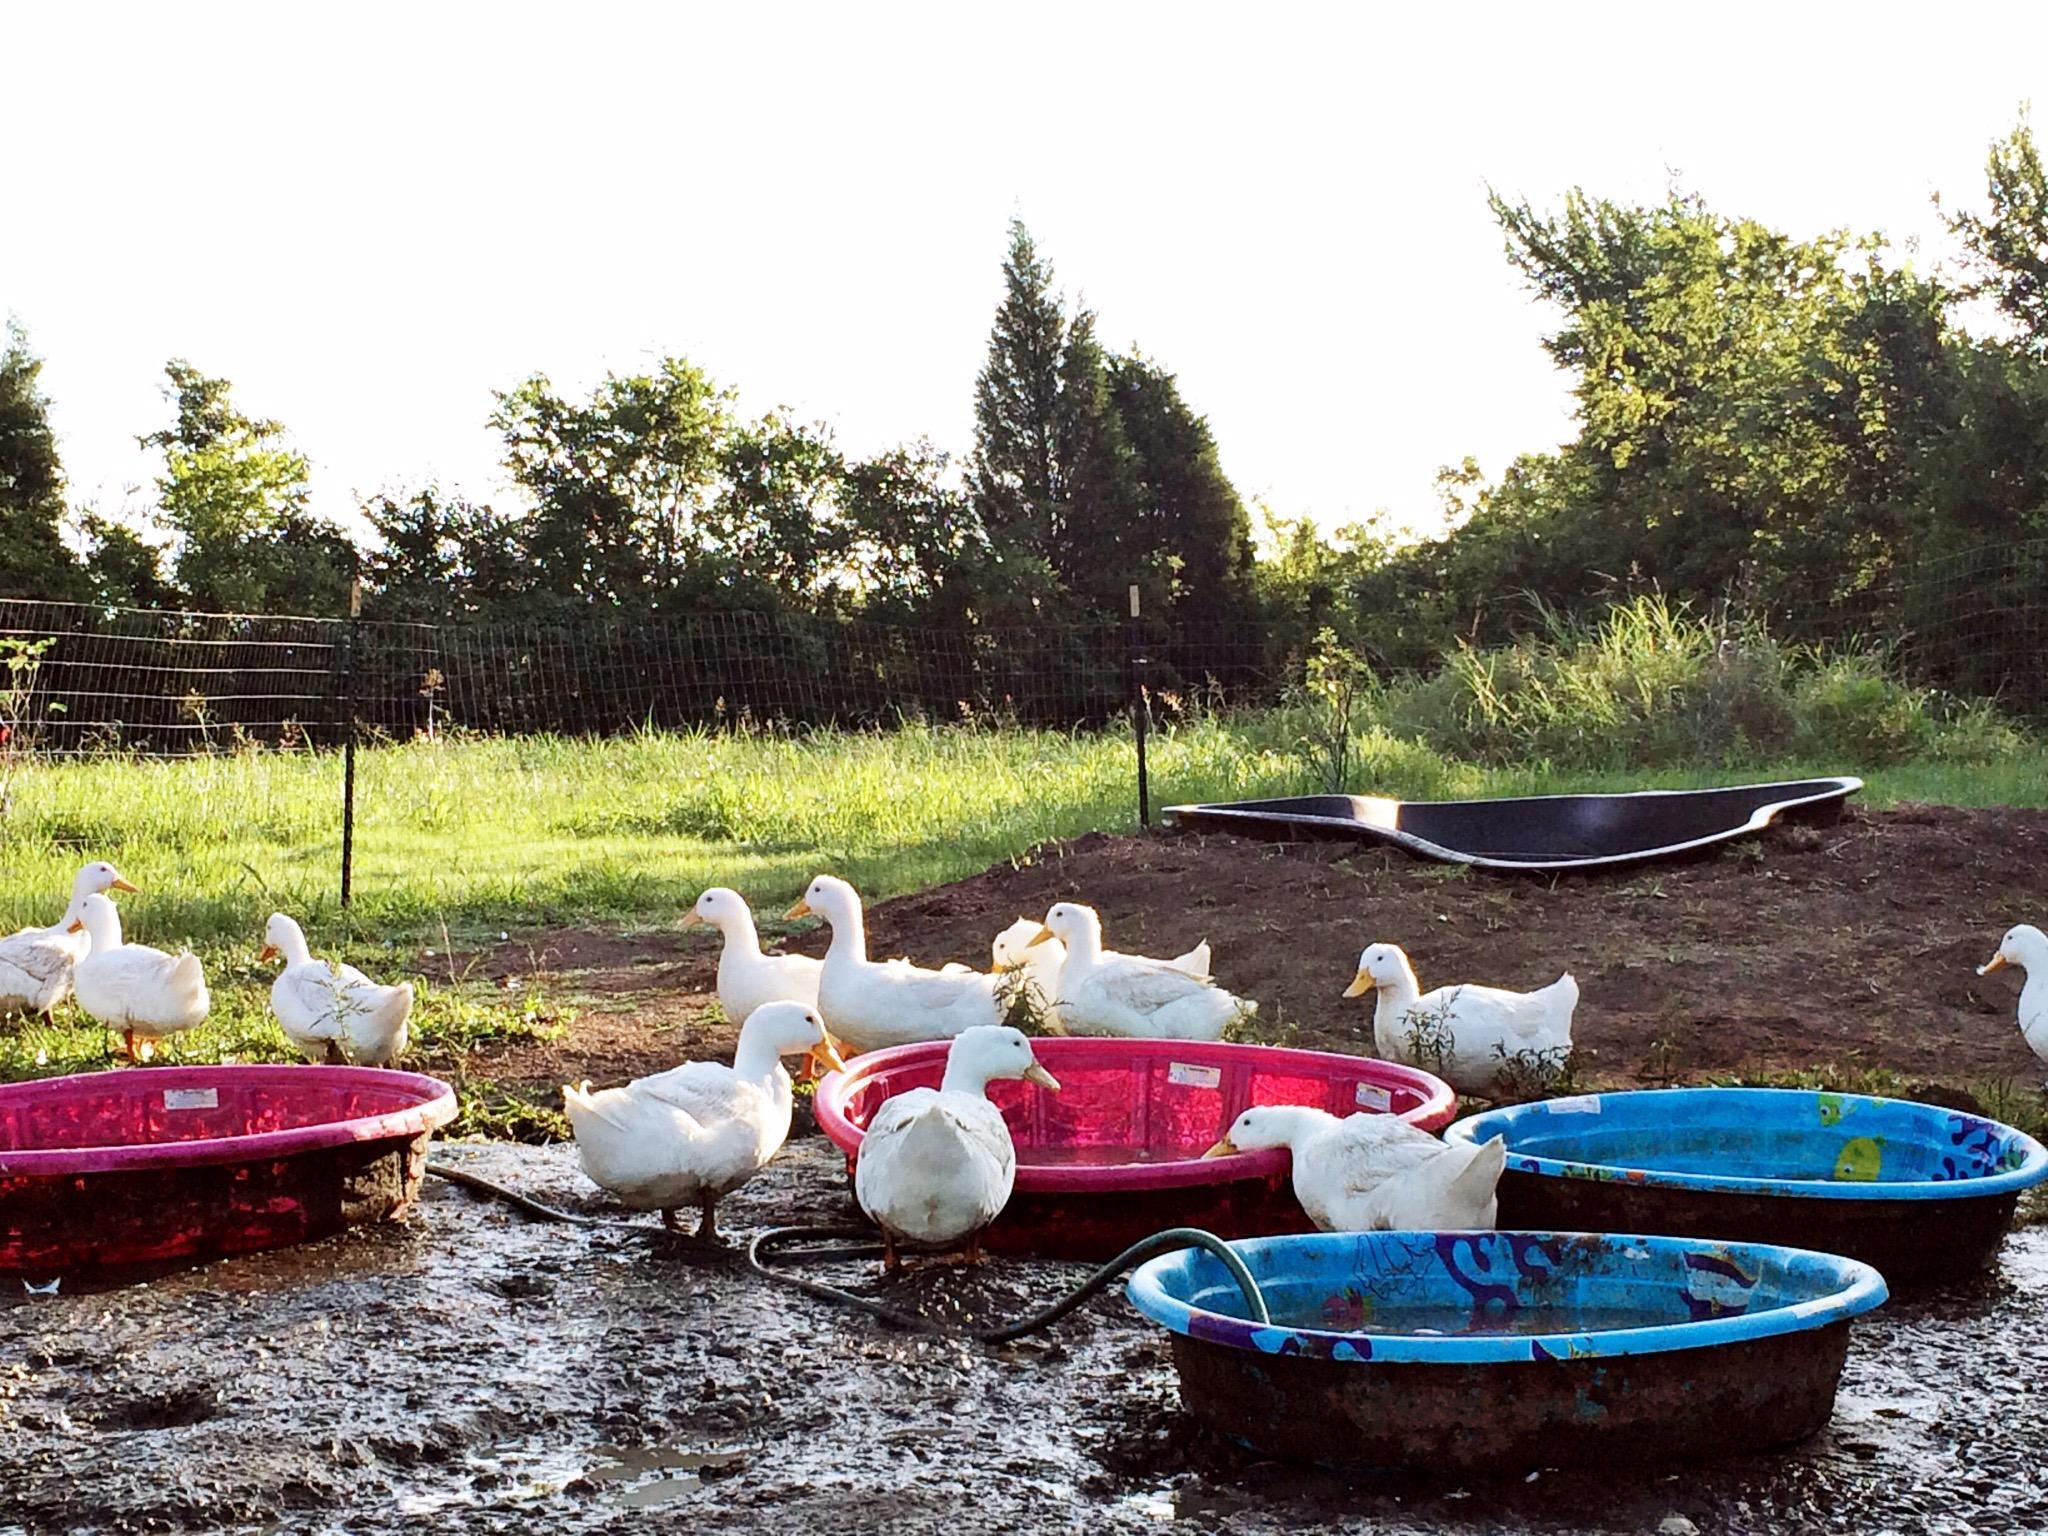 Ducks on a farm in Sunnyvale, near Dallas.jpg